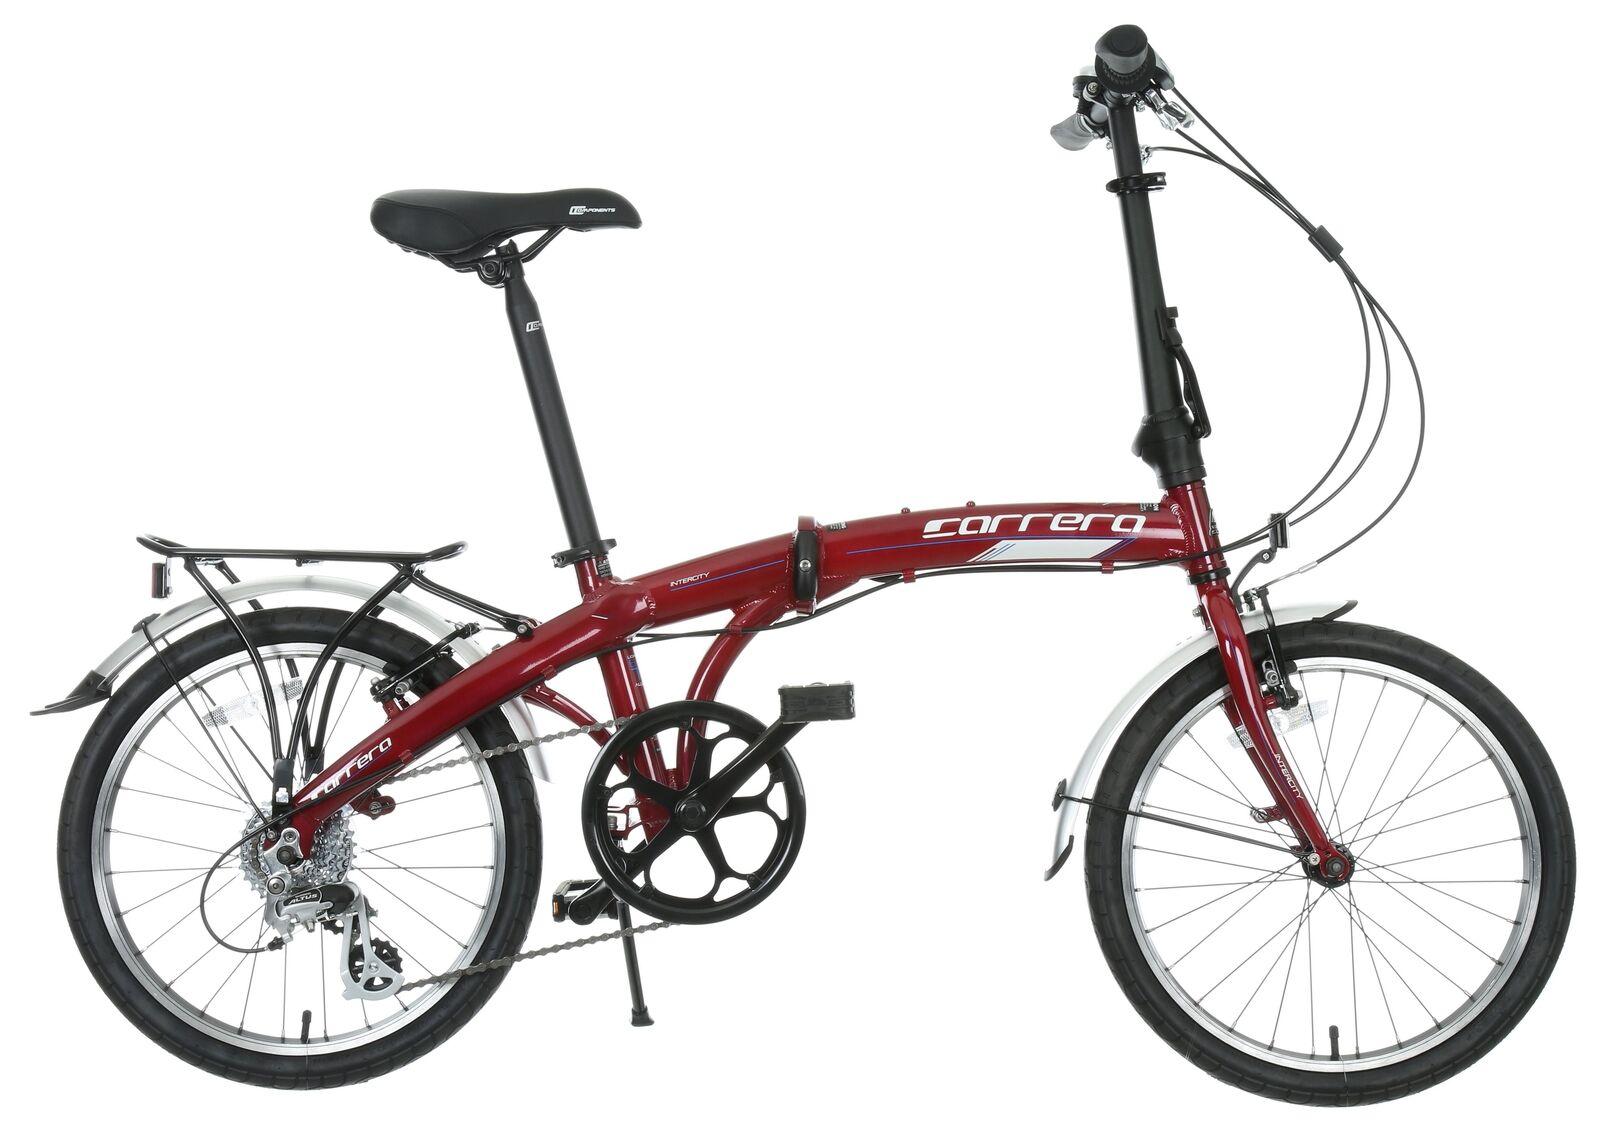 Carrera Intercity Unisex Adults Mens Womens Folding Bike Red Alloy Frame 8 Speed